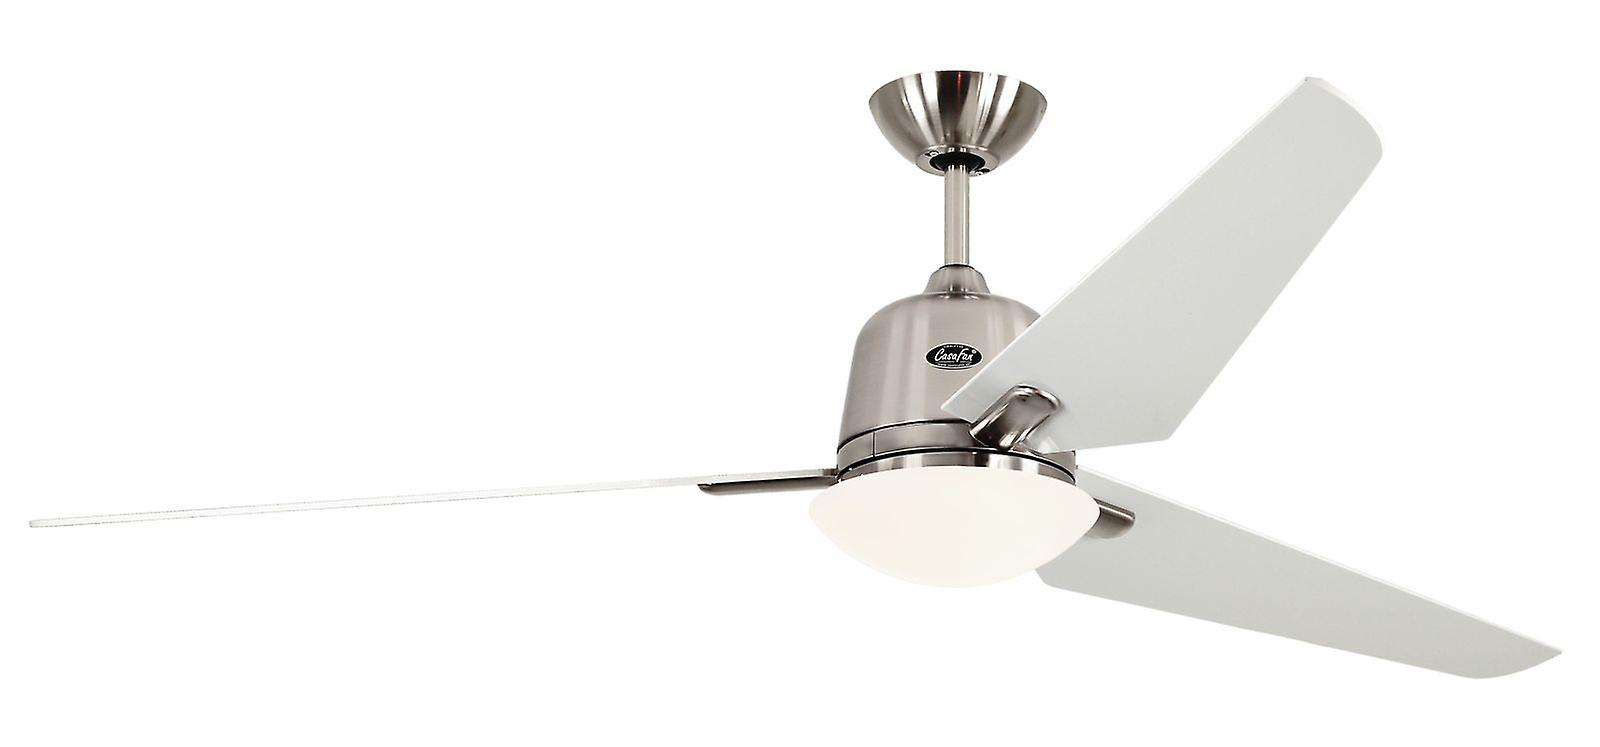 Plafonnier ventilateur Eco Aviatos 162cm 64 & 034;BN lames blanc